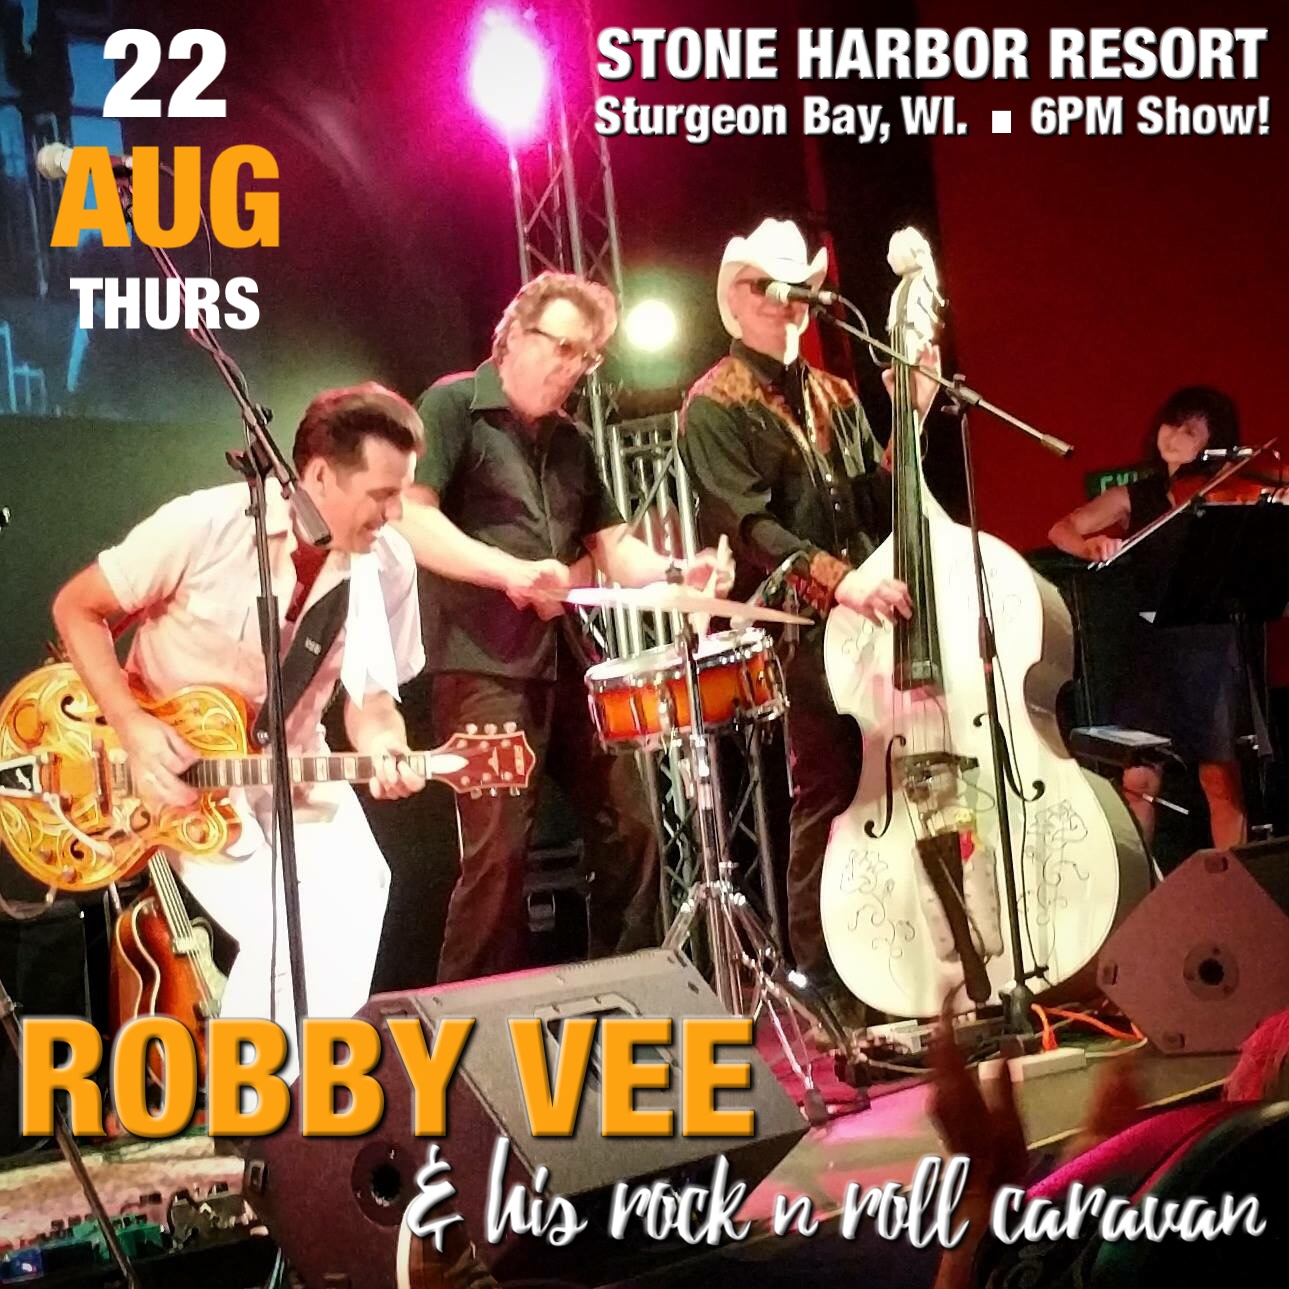 robby vee,stone harbor, live music